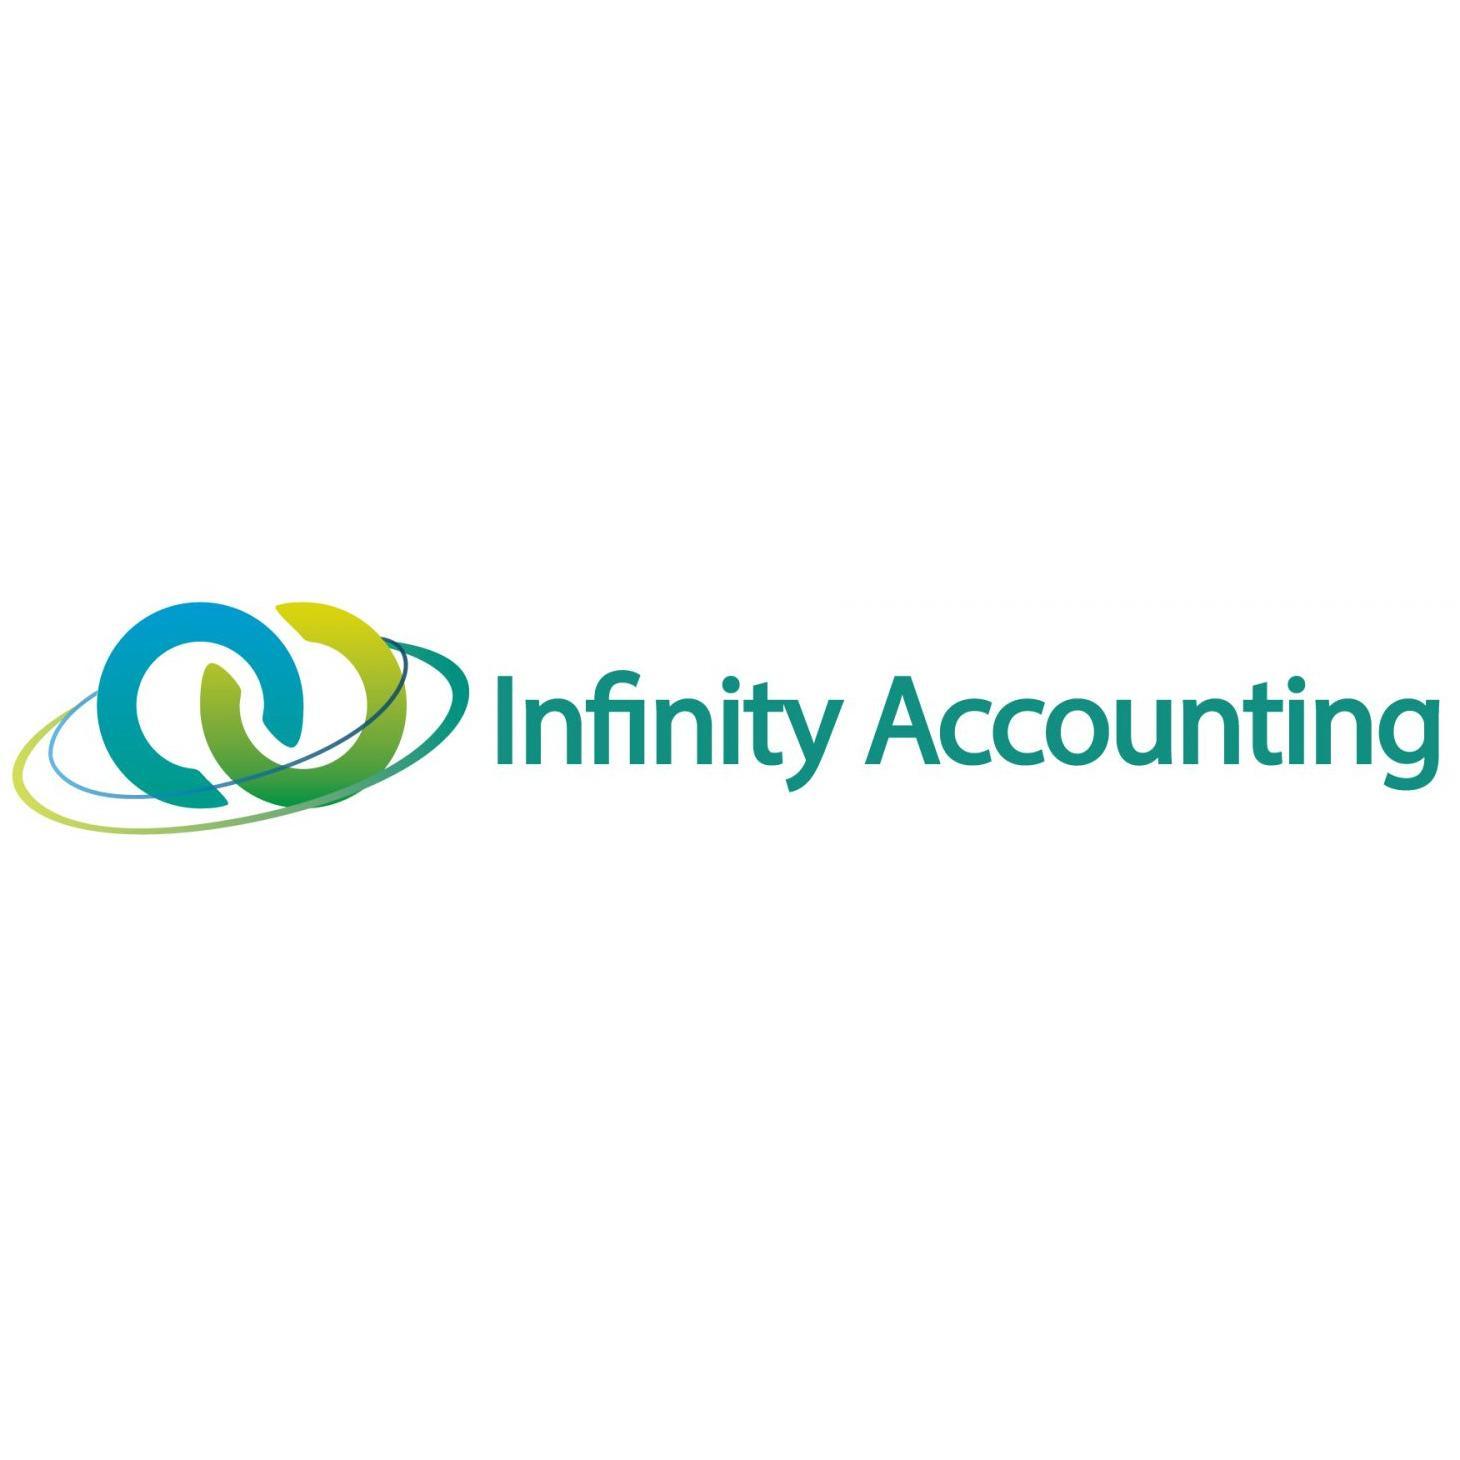 Infinity Accounting